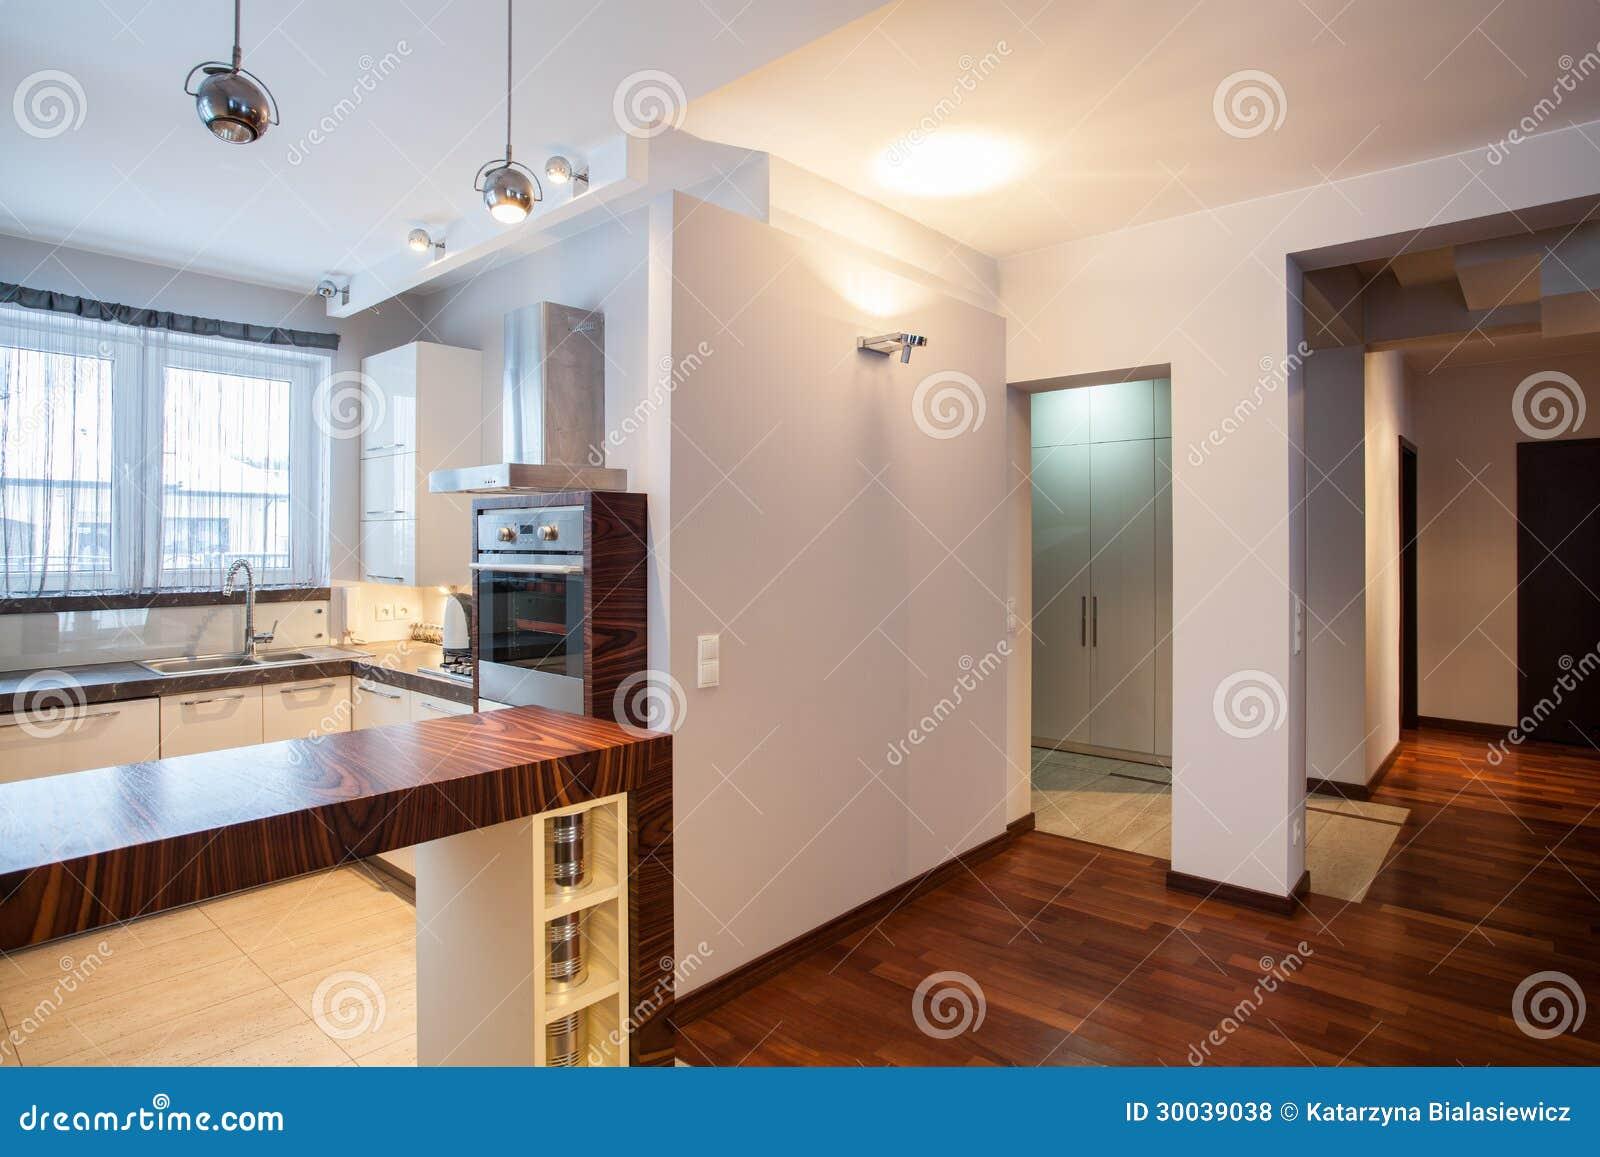 Country Home Kitchen Corridor Royalty Free Stock Photos